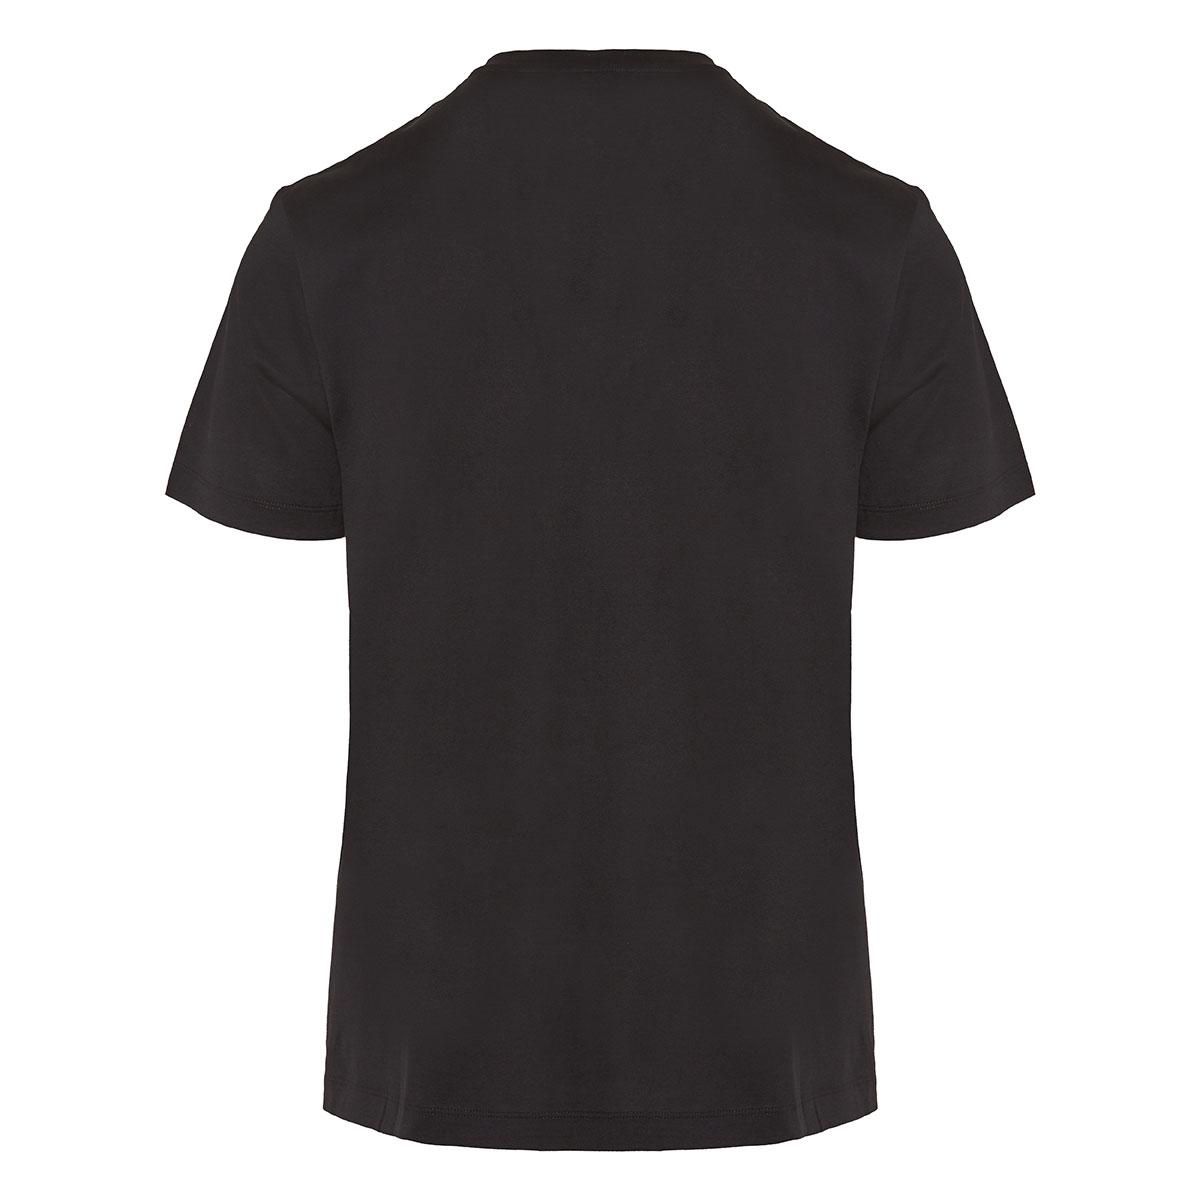 Medusa print T-shirt